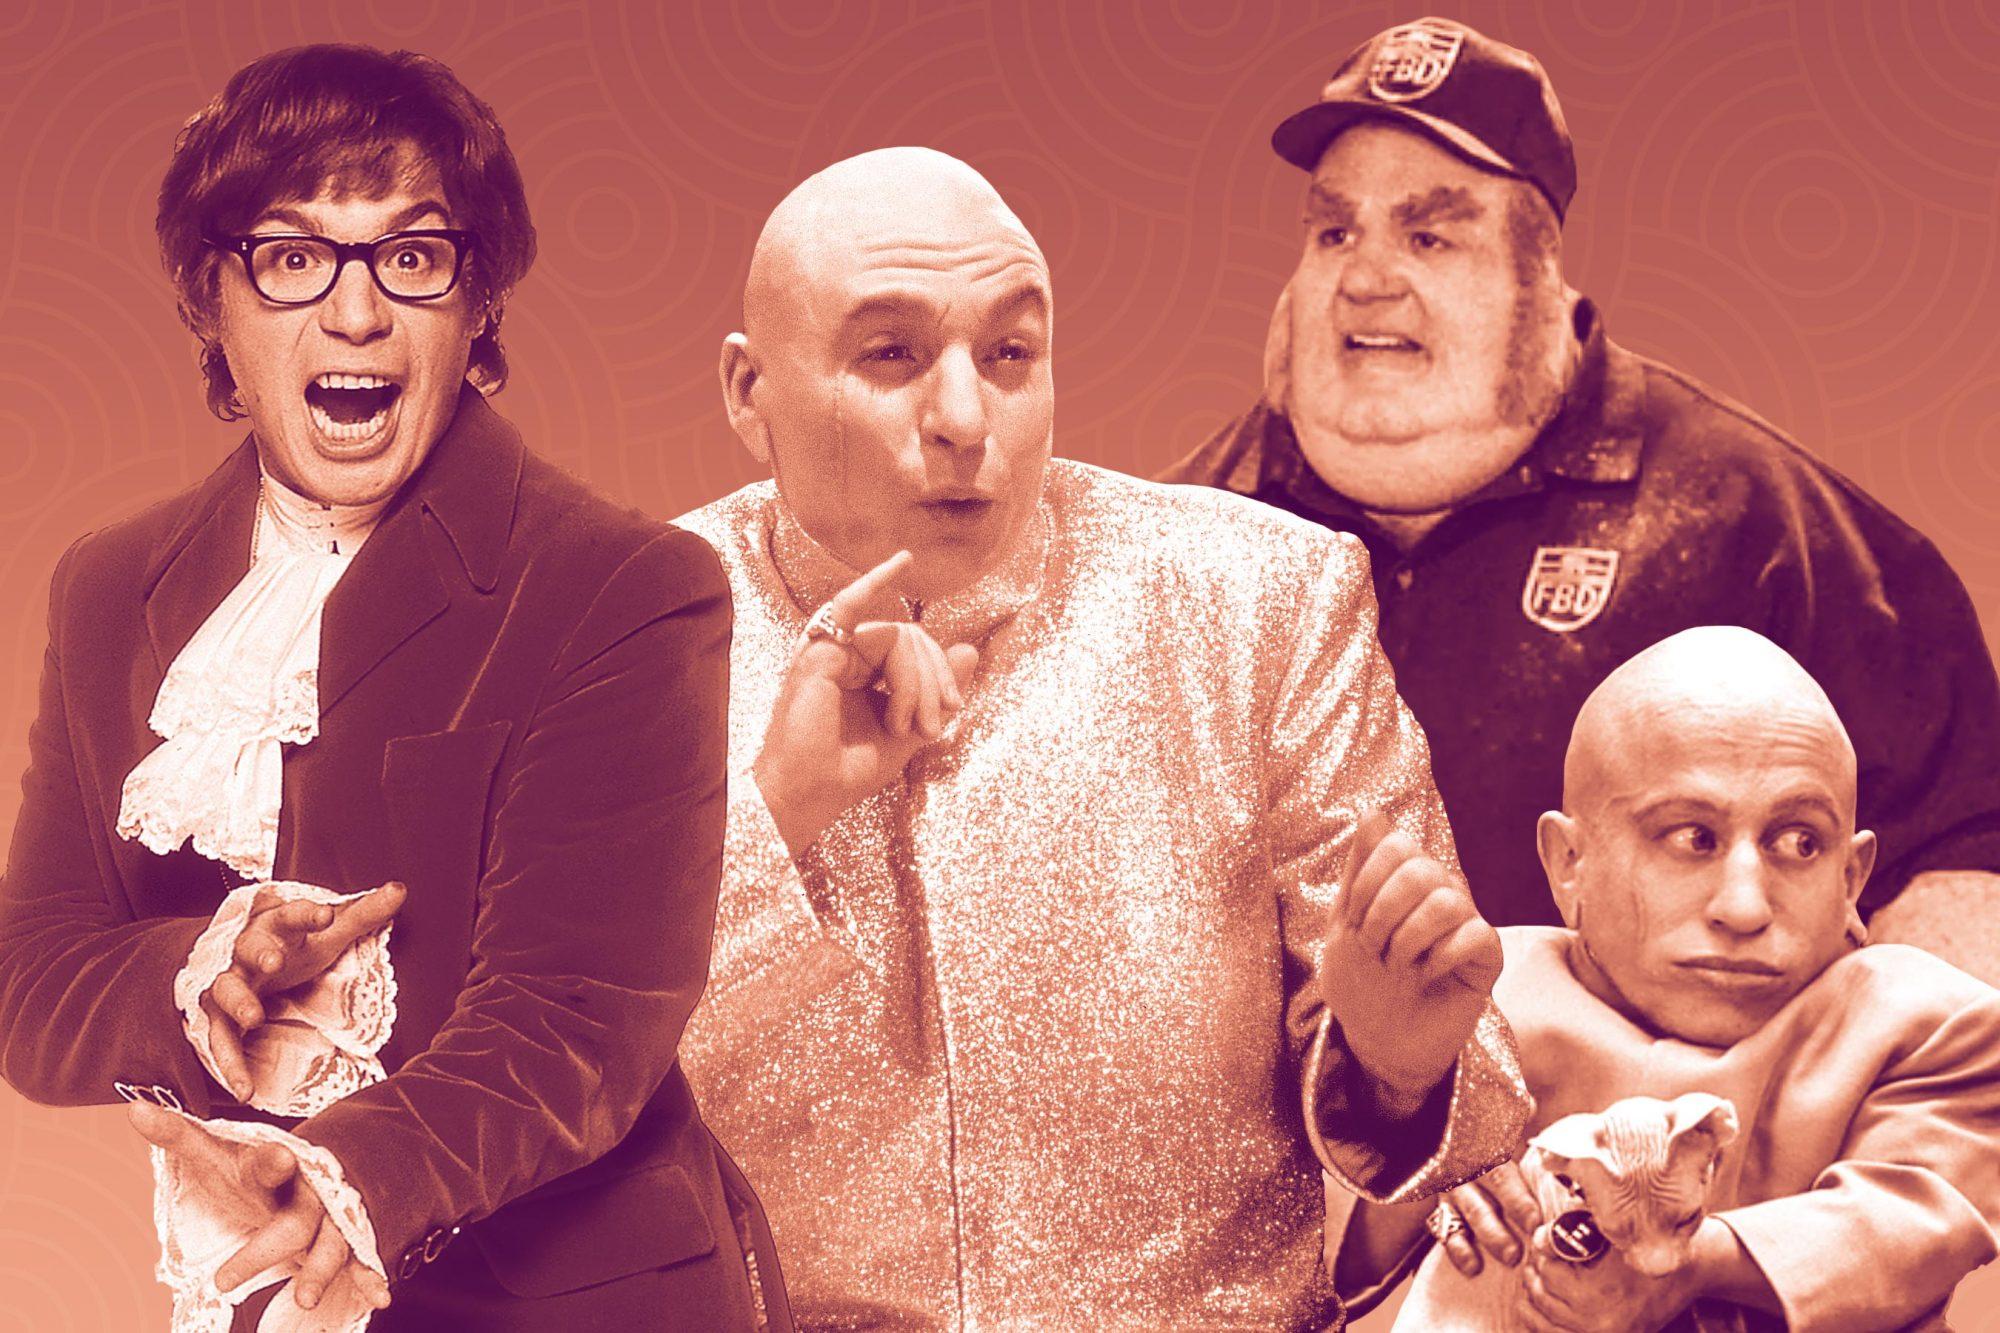 Fat Boy Halloween 2020 Michael Myers Mike Myers on Austin Powers' Fat Bastard, Mini Me, Dr. Evil   EW.com